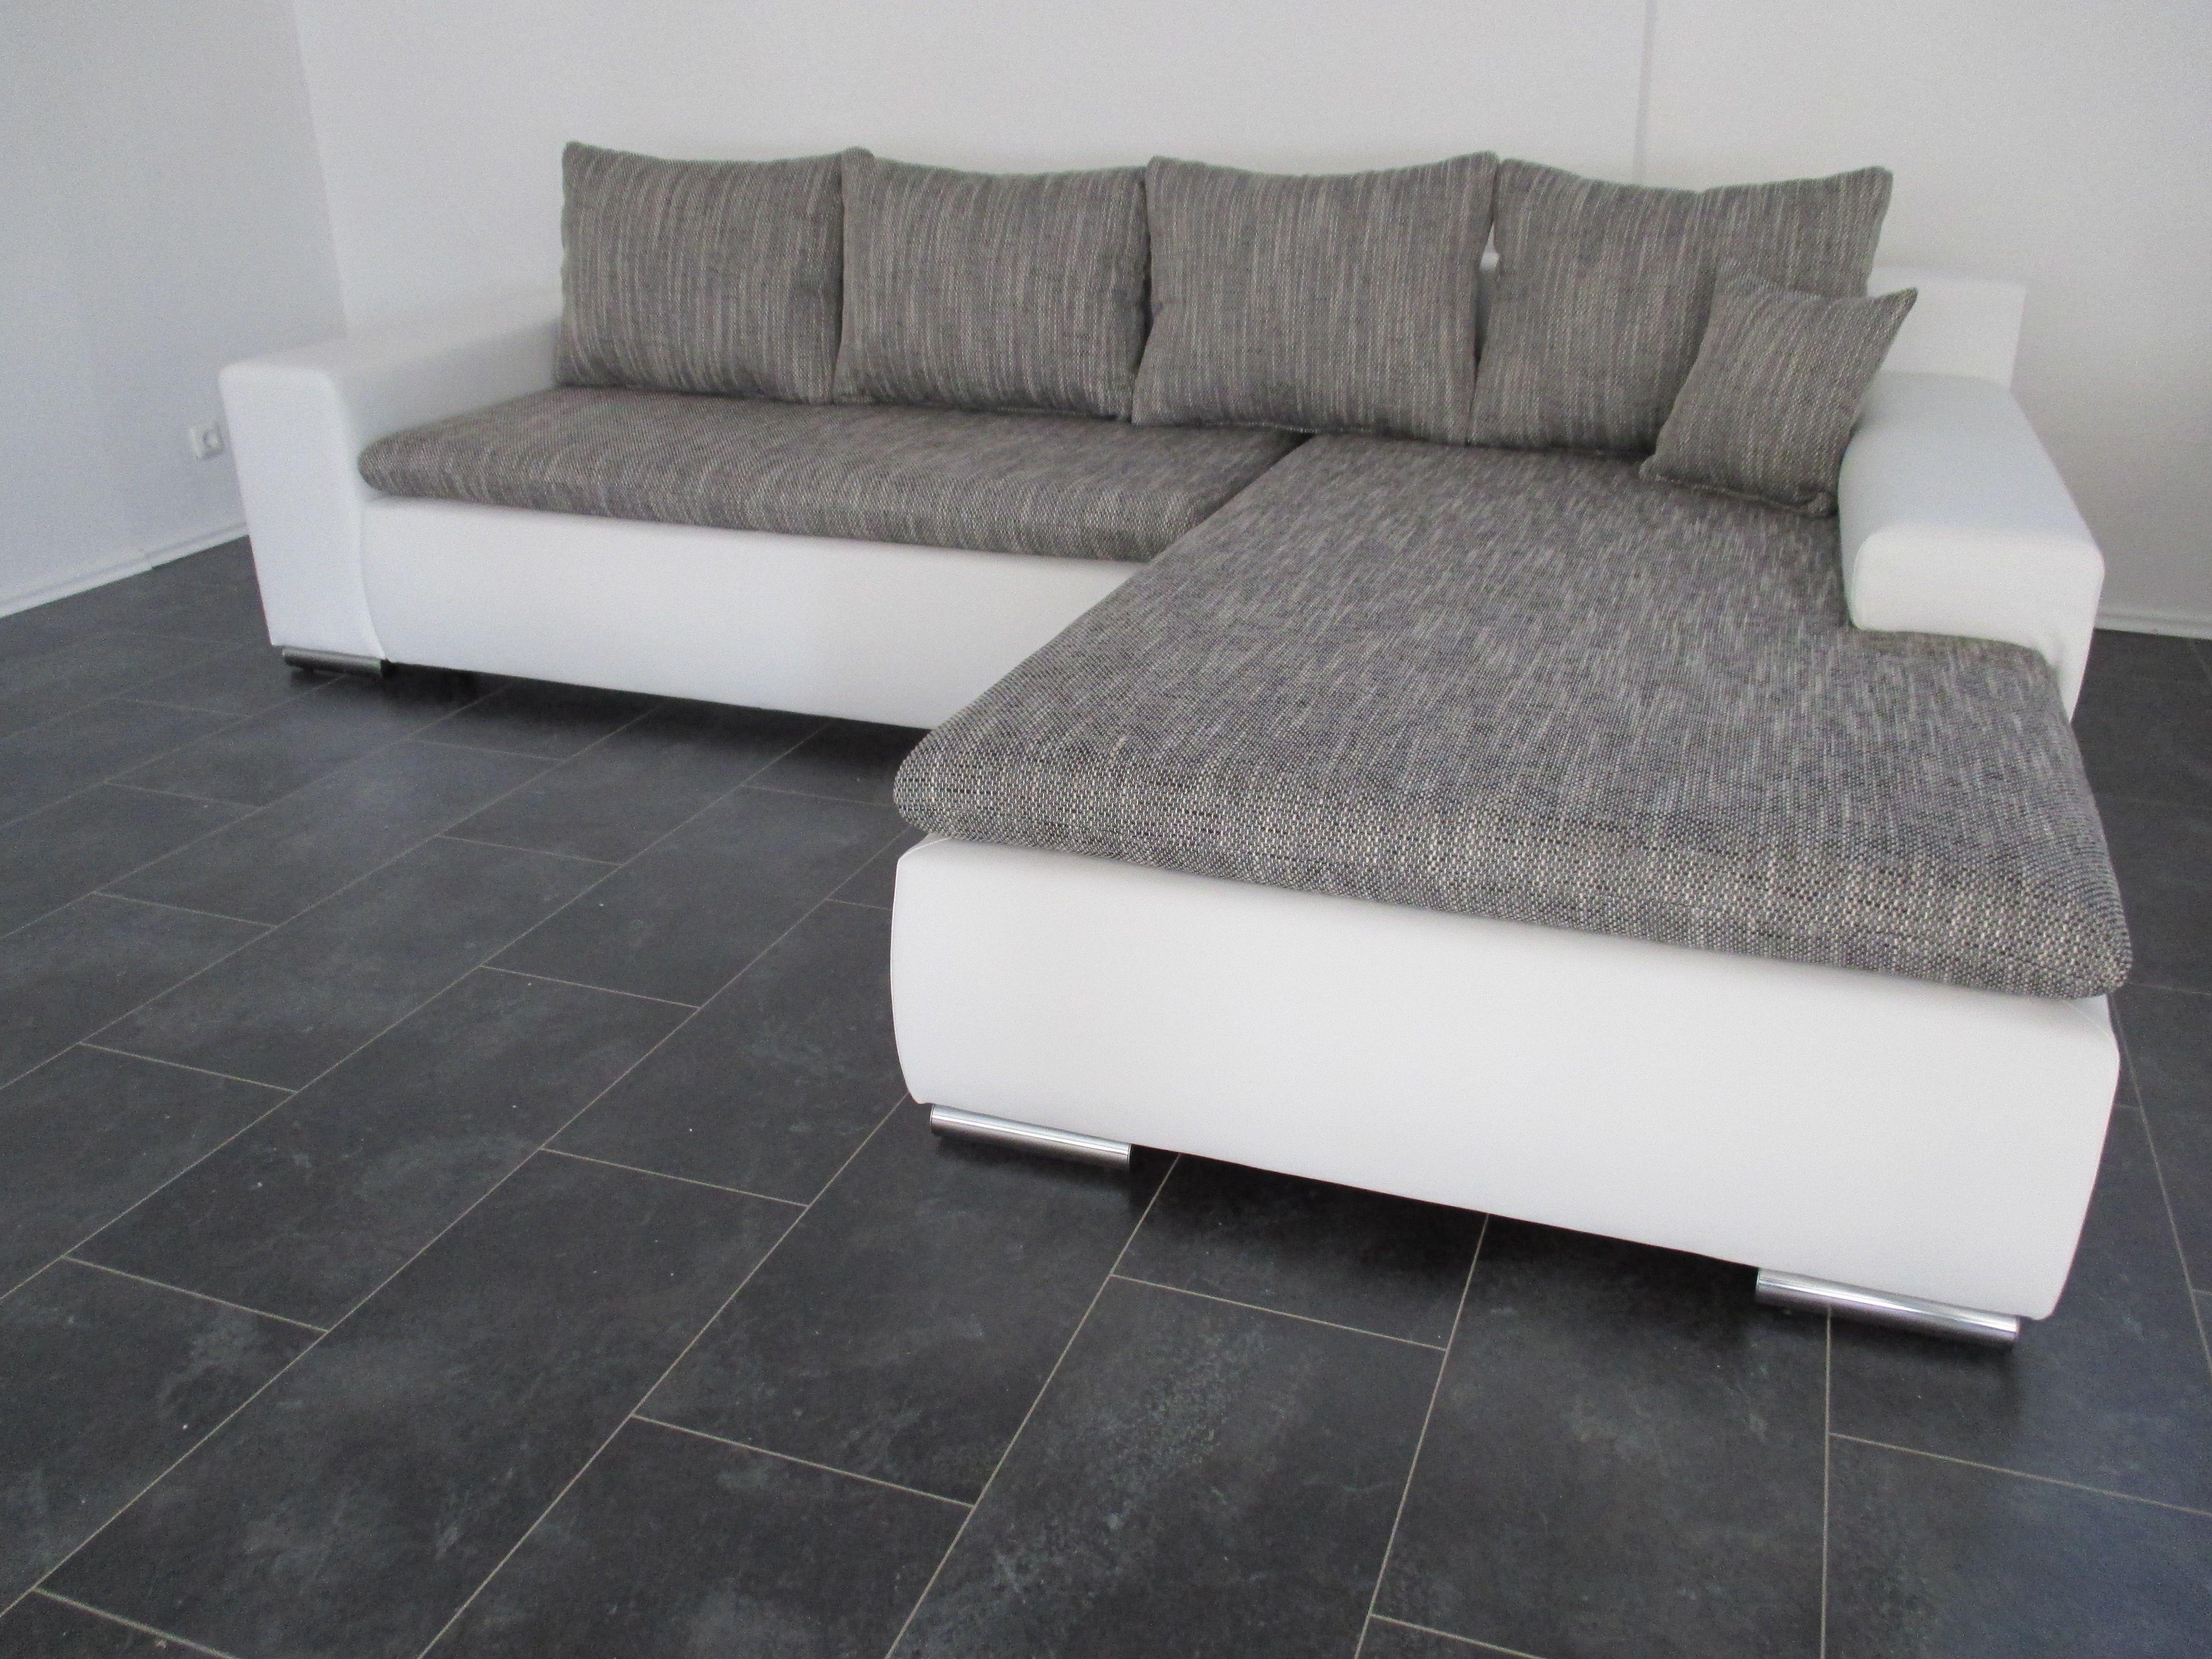 Sofa fabrikverkauf refil sofa for Sofa lagerverkauf